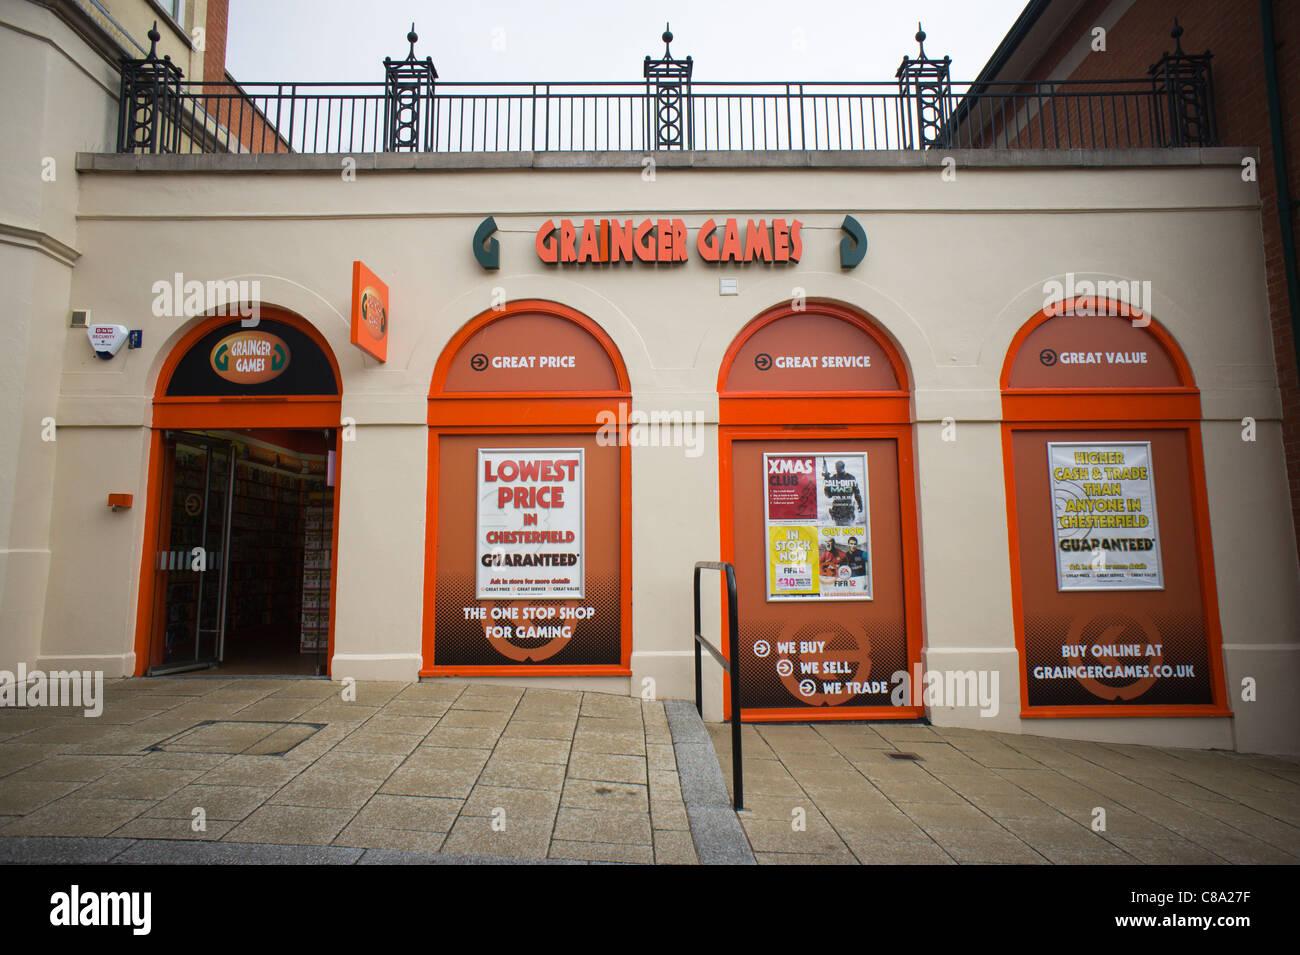 Grainger Games shop frontage on Steeplegate Vicar Lane shopping centre Chesterfield - Stock Image